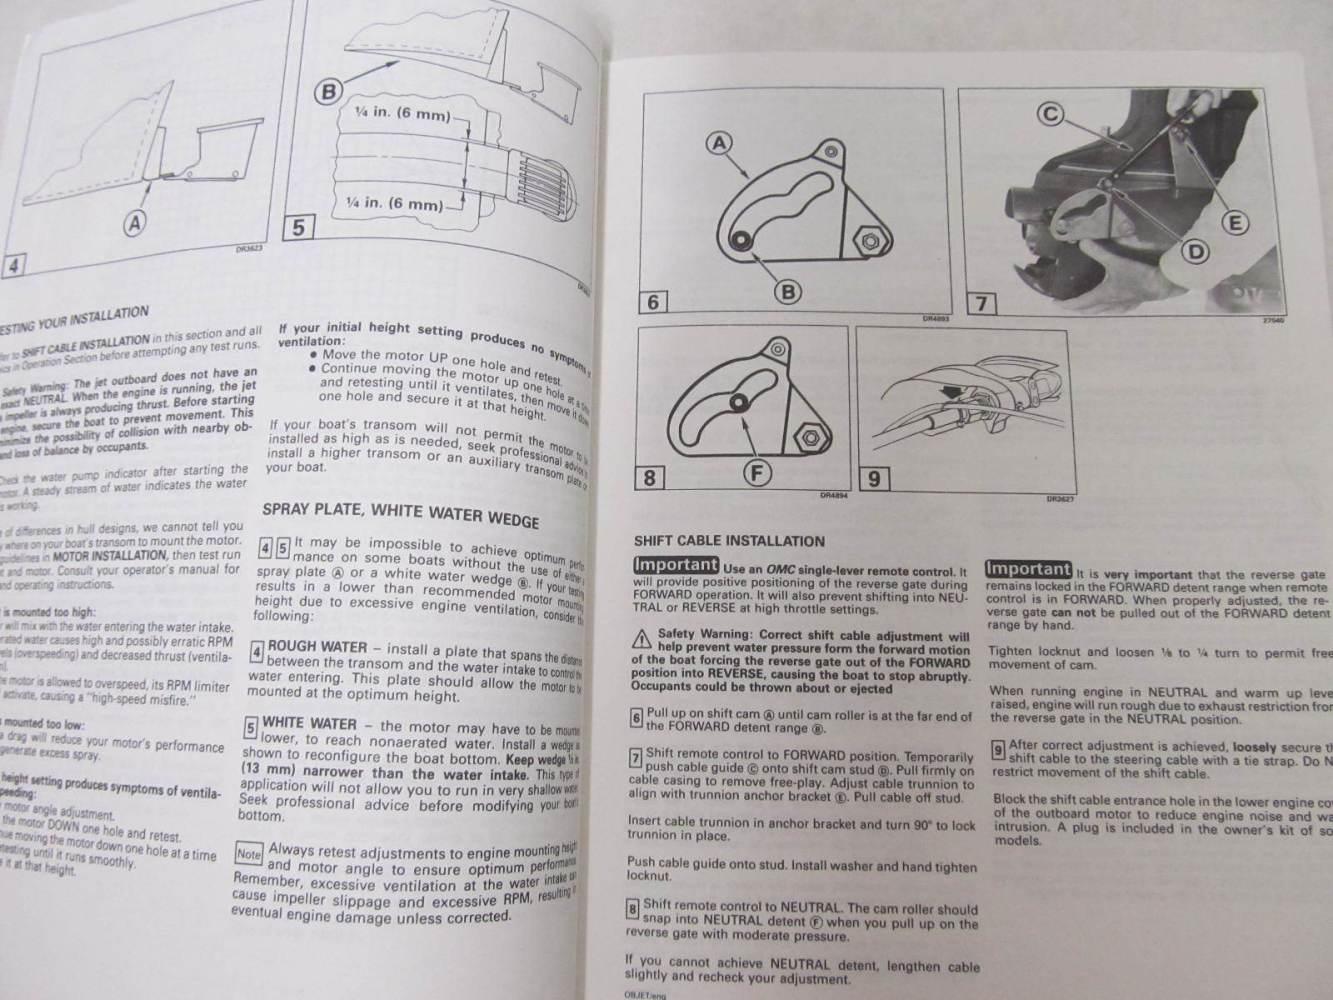 medium resolution of  array 212339 omc jet outboard operation u0026 maintenance manual supplement rh greenbayprop com